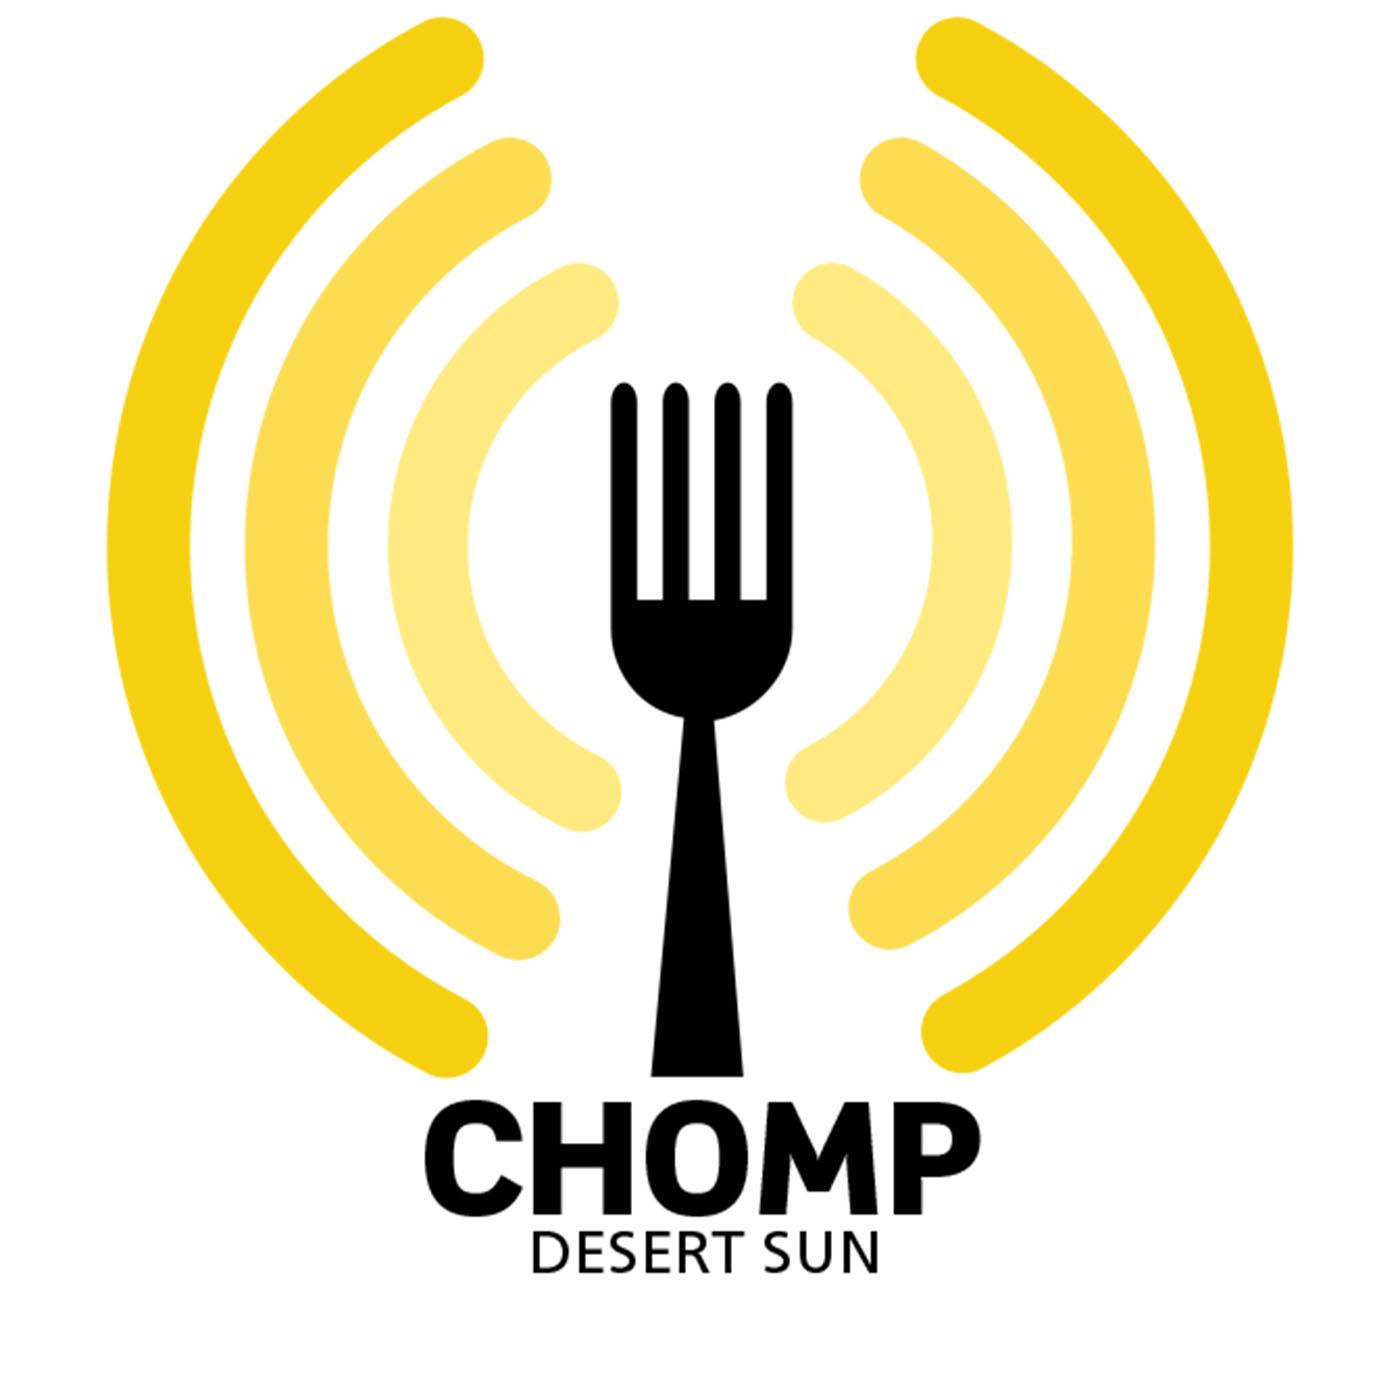 Chomp, by The Desert Sun